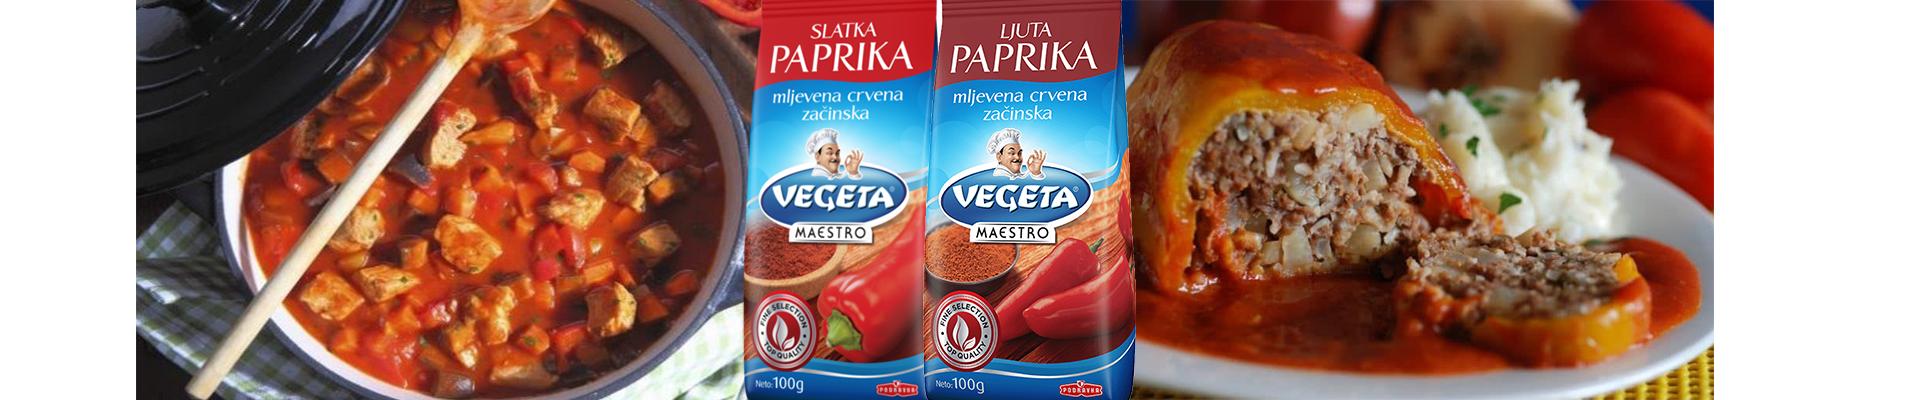 Vegeta Maestro Mlevena Paprika !